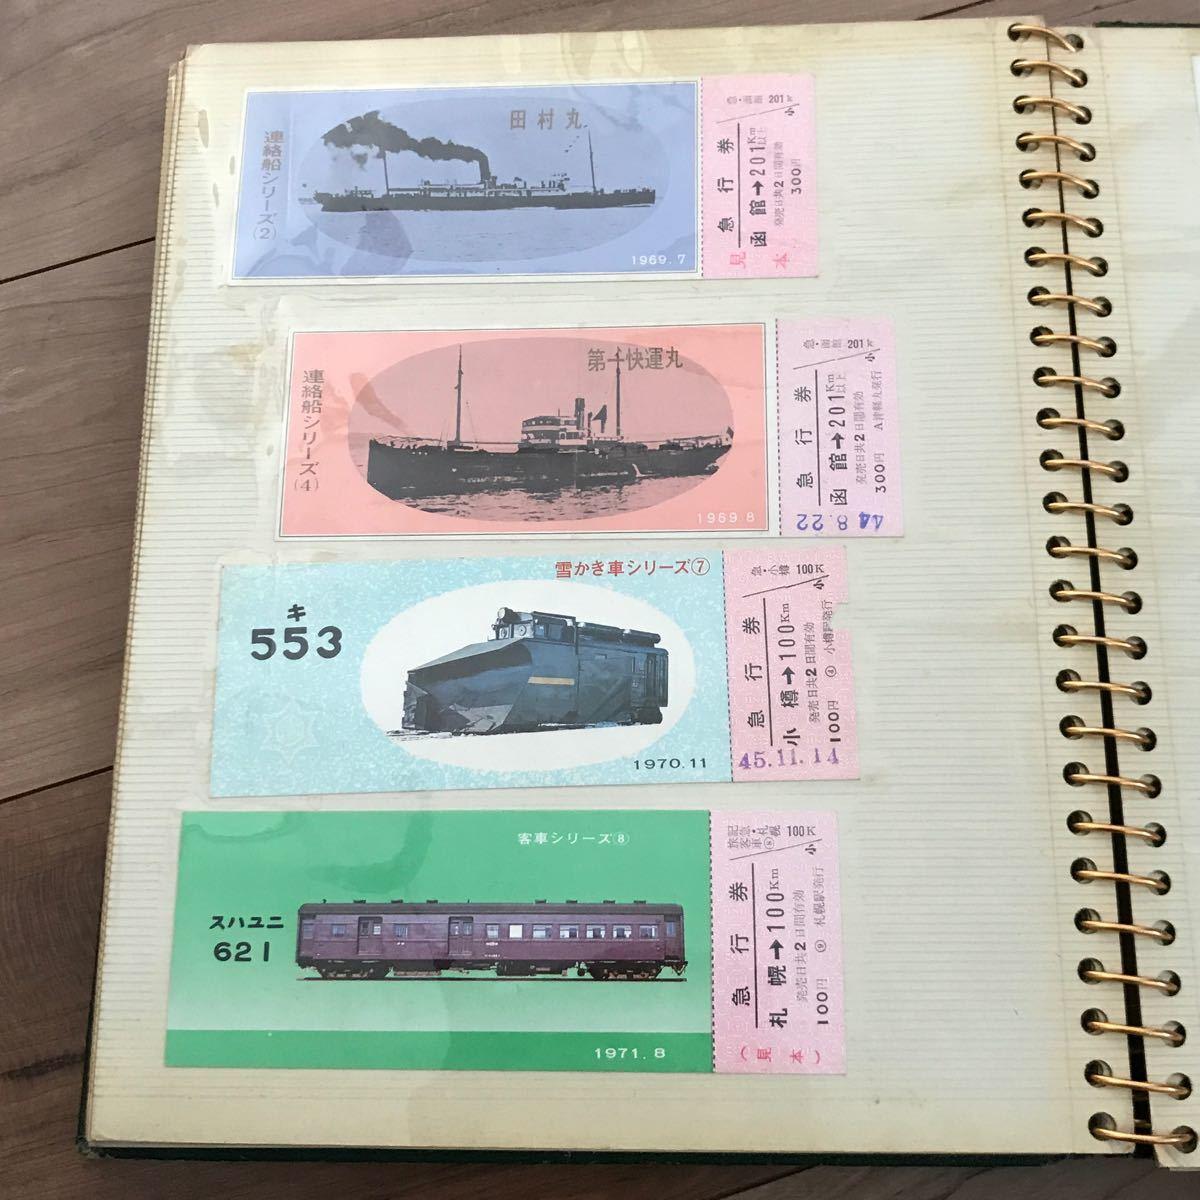 記念入場券 さよなら 記念乗車券 国鉄 東京 相模線 西 寒川 鉄道管理局